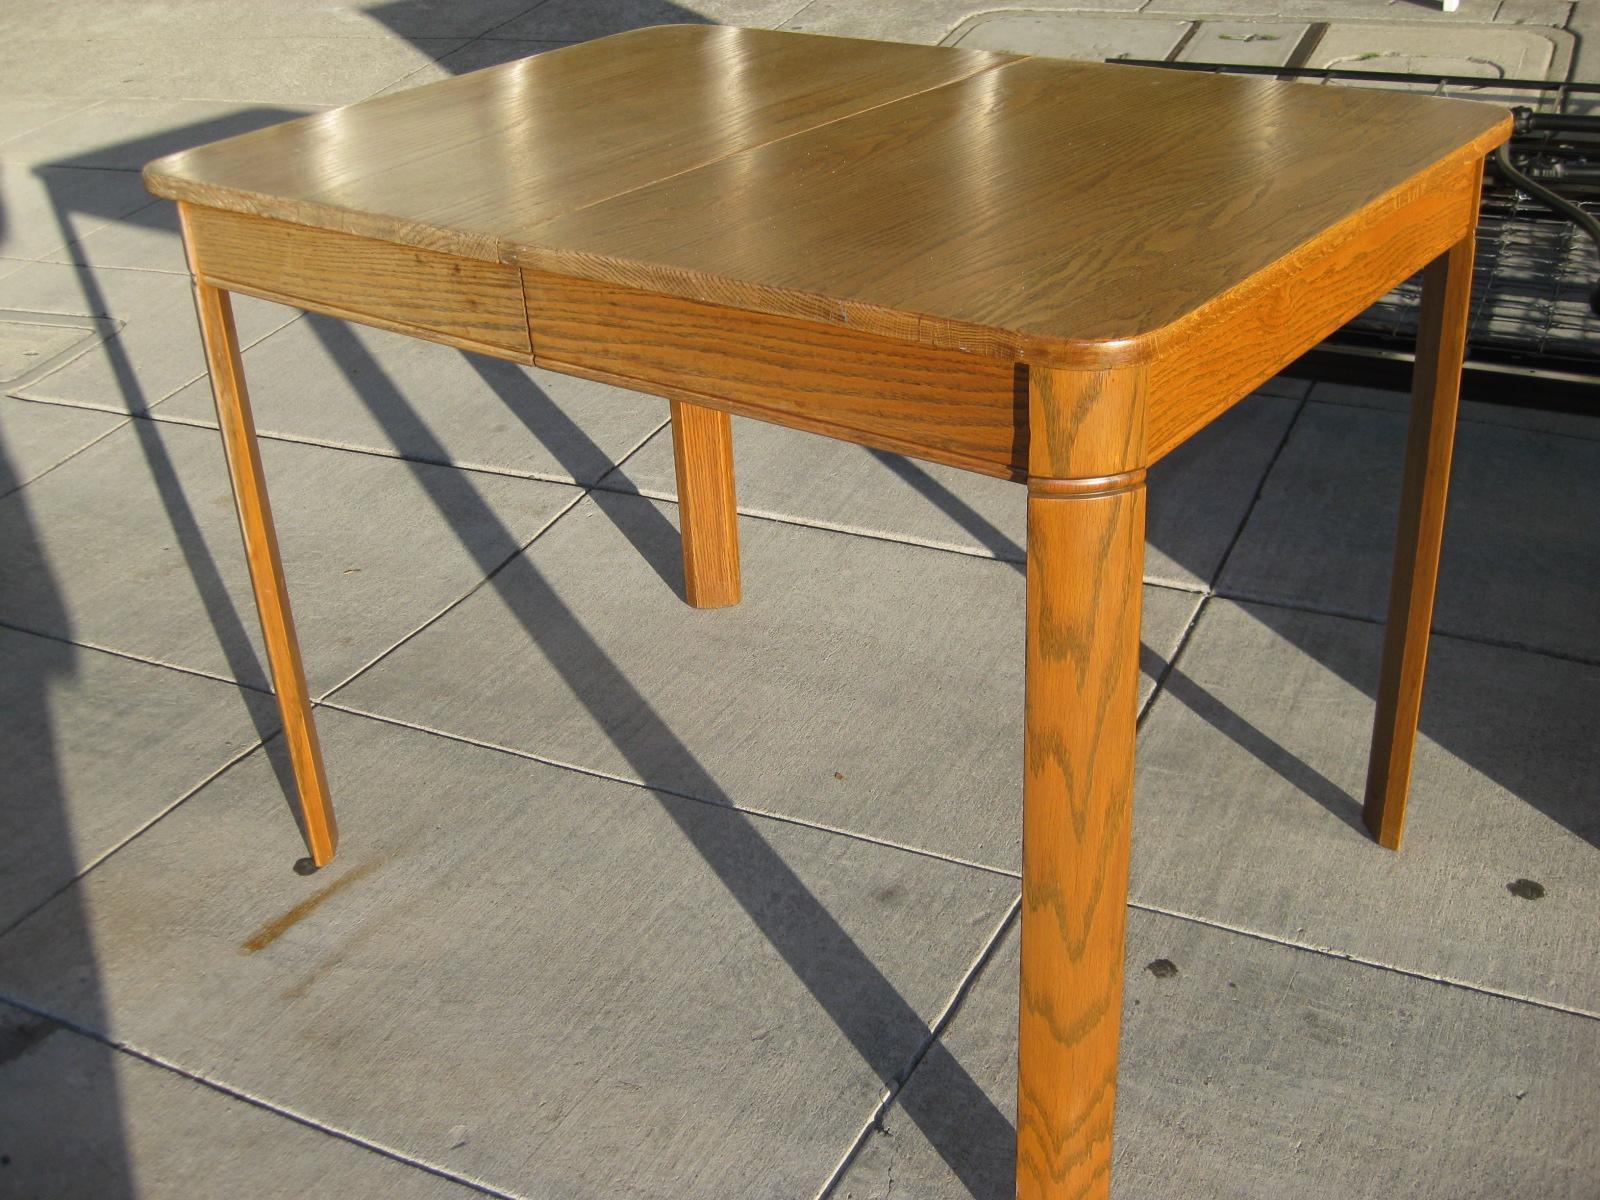 uhuru furniture collectibles sold solid oak kitchen